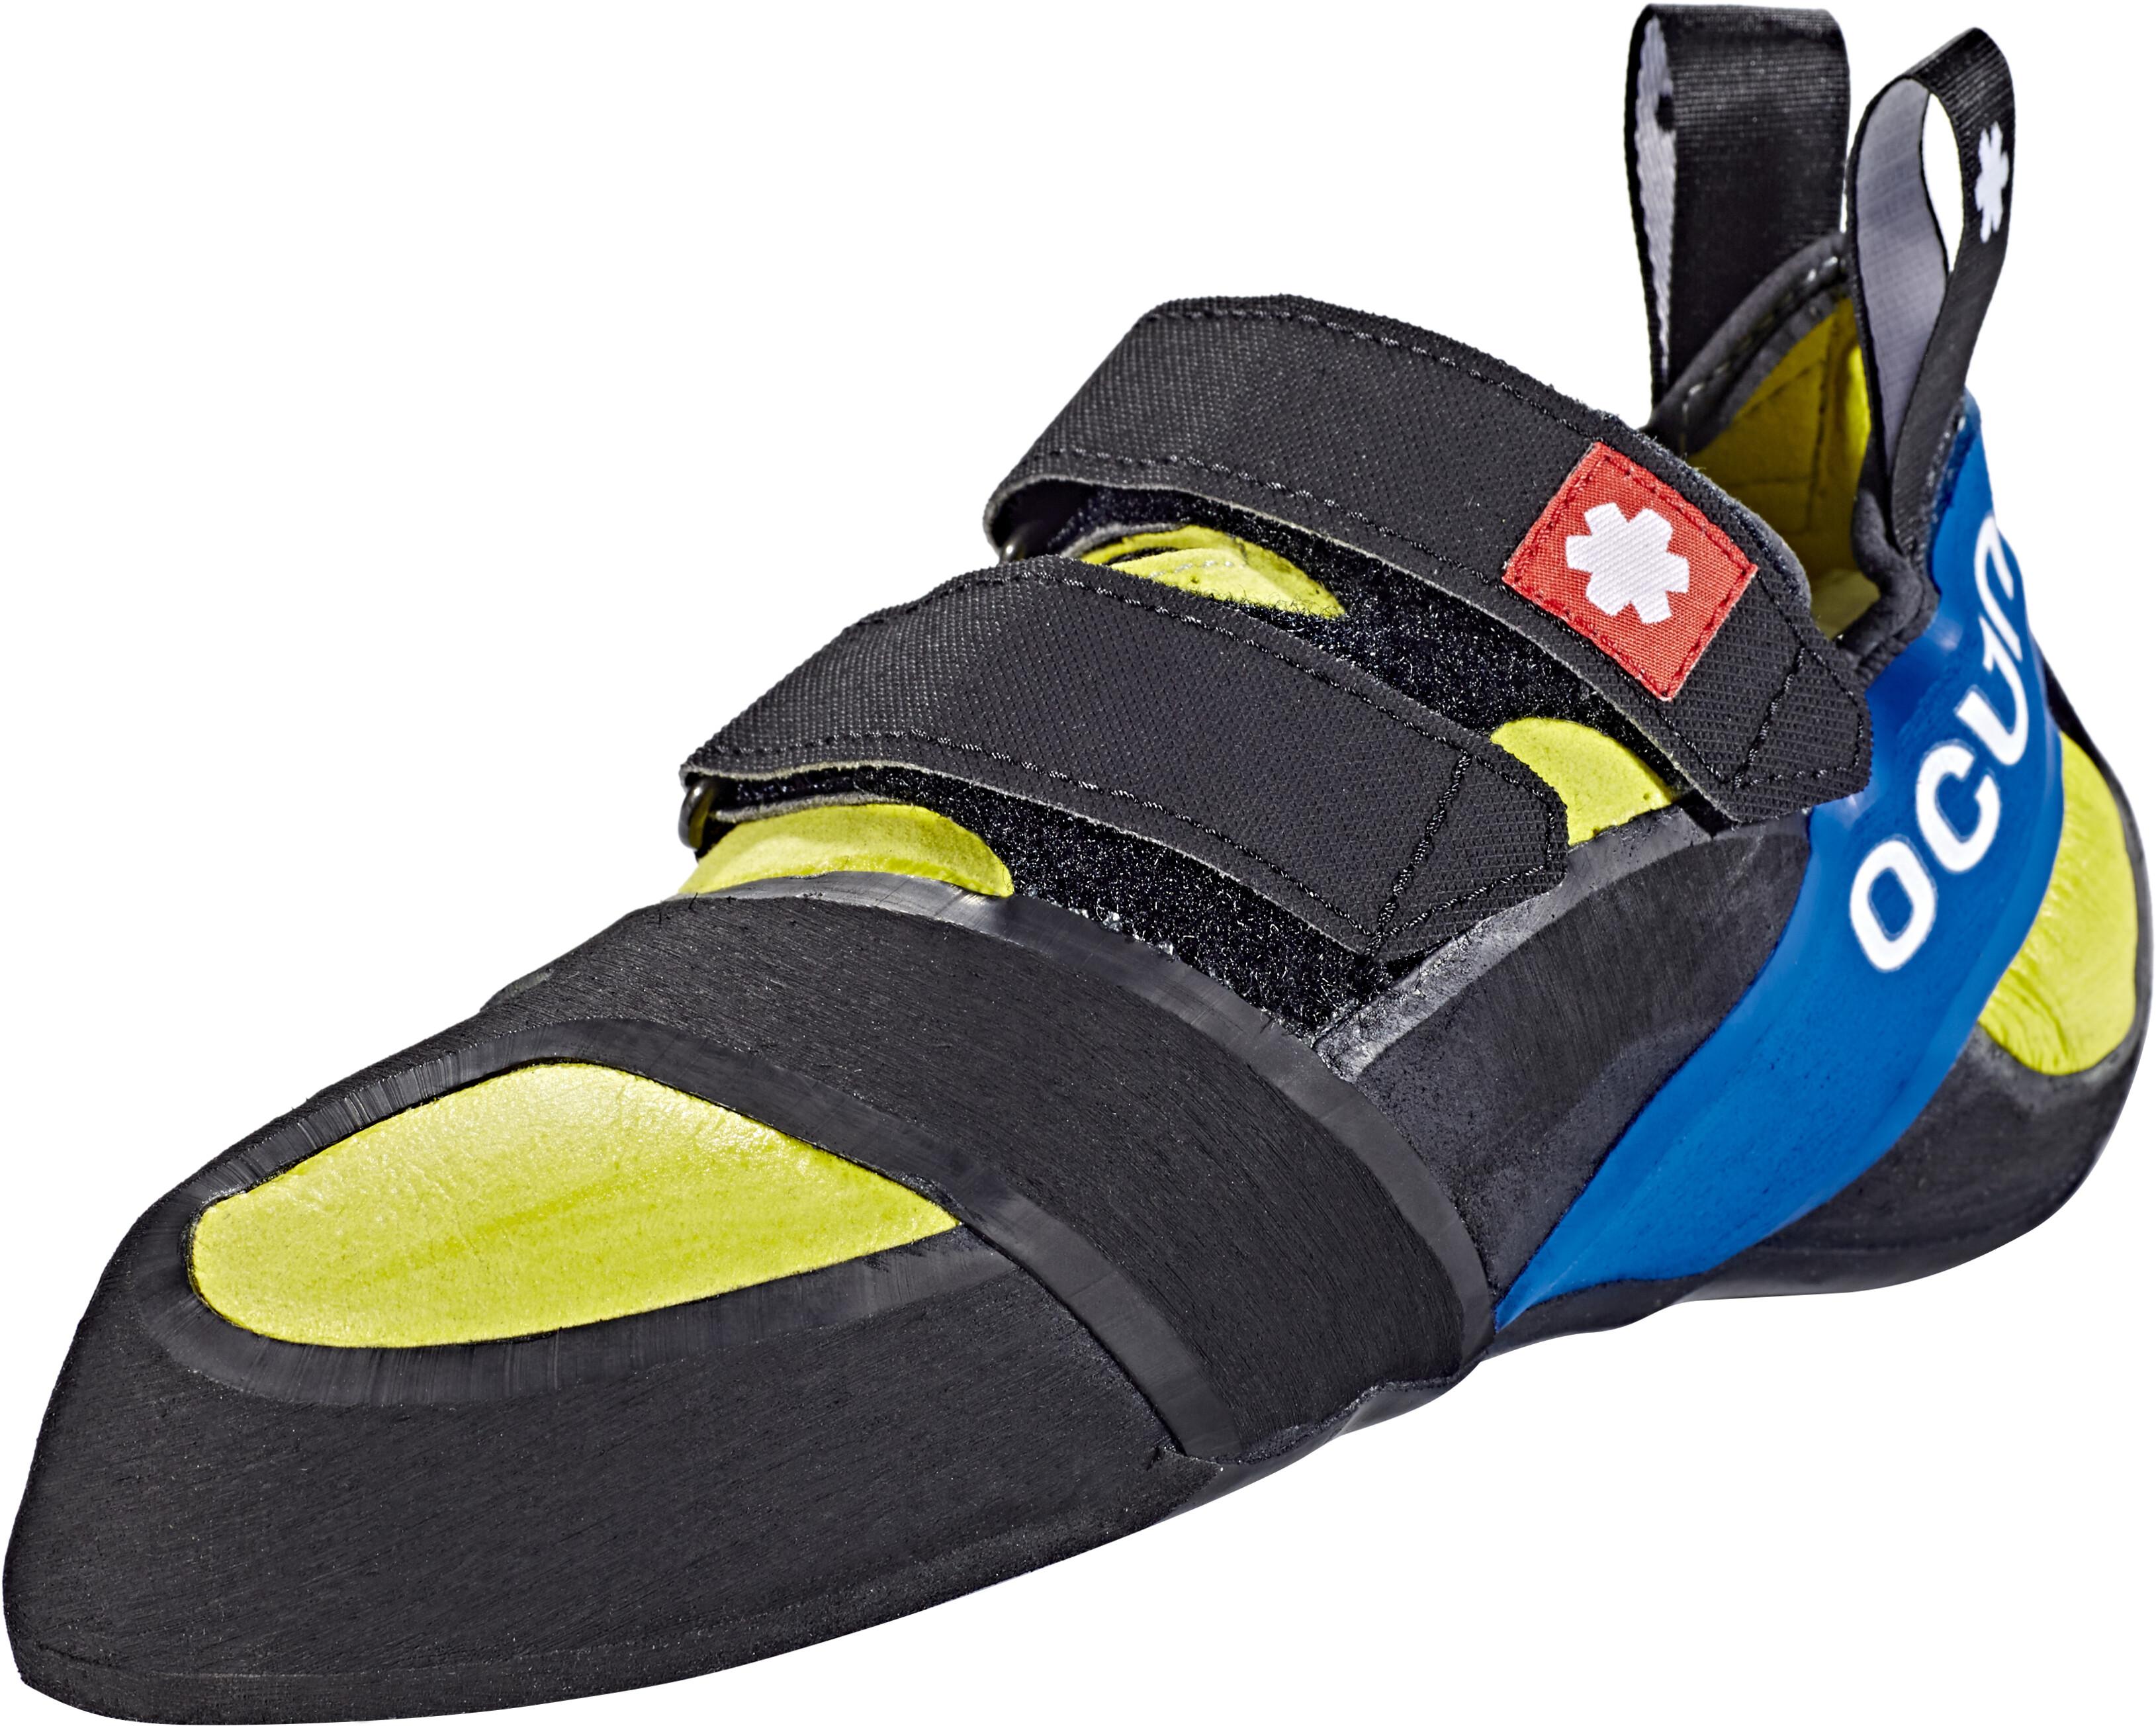 Black Diamond Ozone Klettergurt : Ocun ozone climbing shoes campz.de